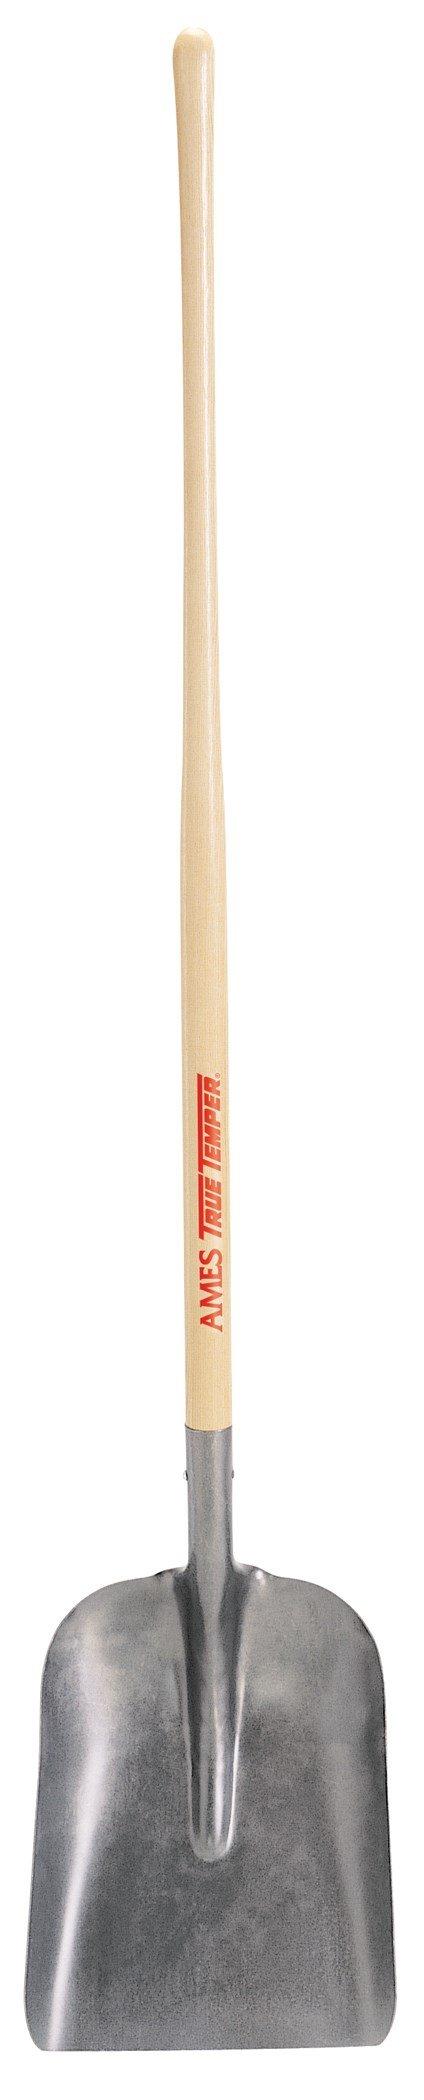 True Temper Shovel 48 '' General Purpose 11 '' X 13-1/2 ''